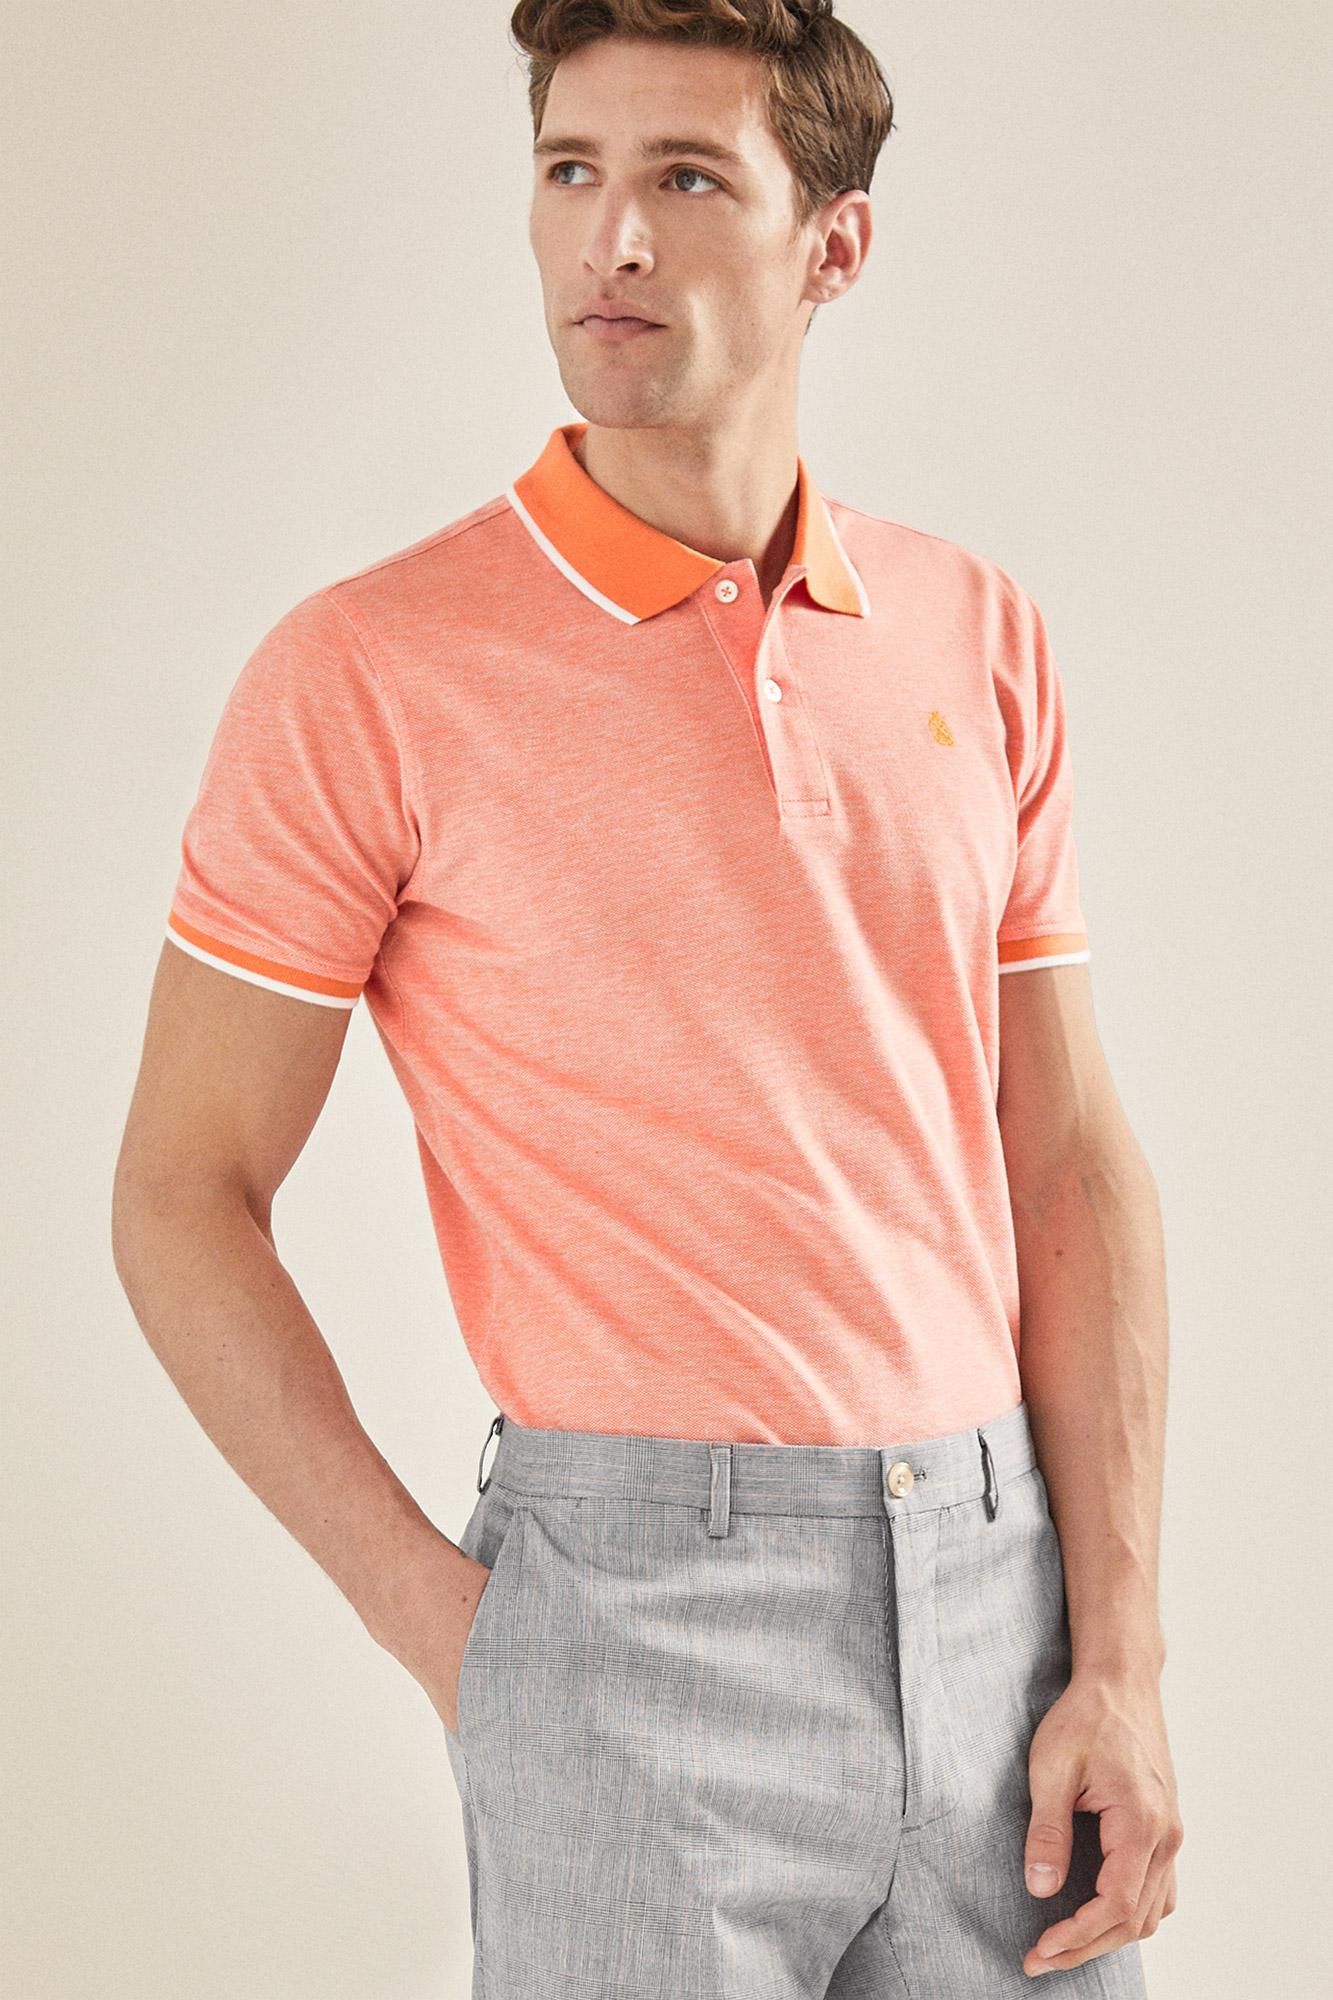 e7919a07c Basic short-sleeved polo shirt